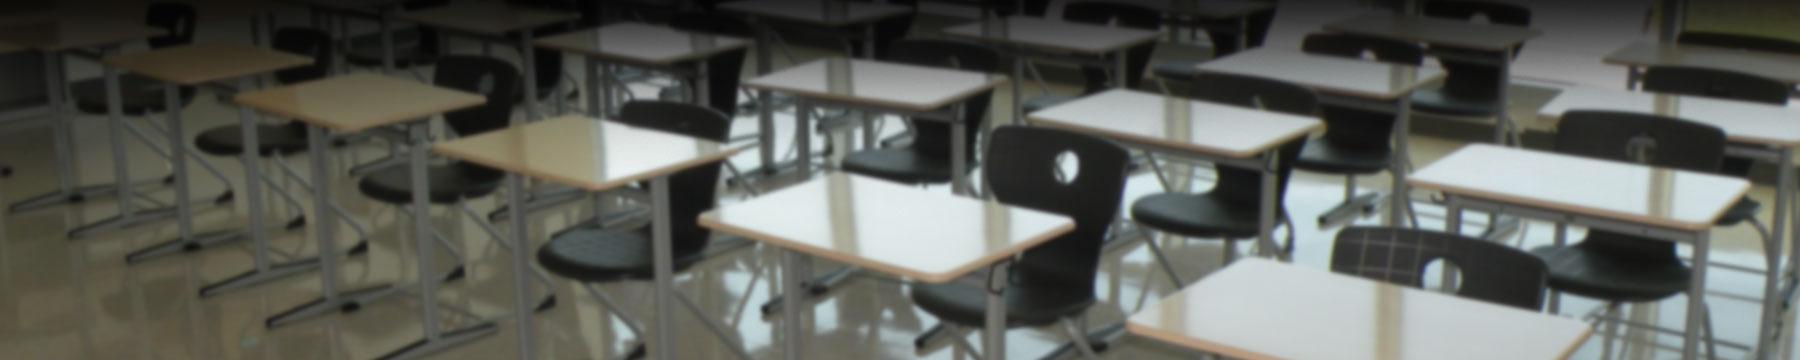 home_classroom1